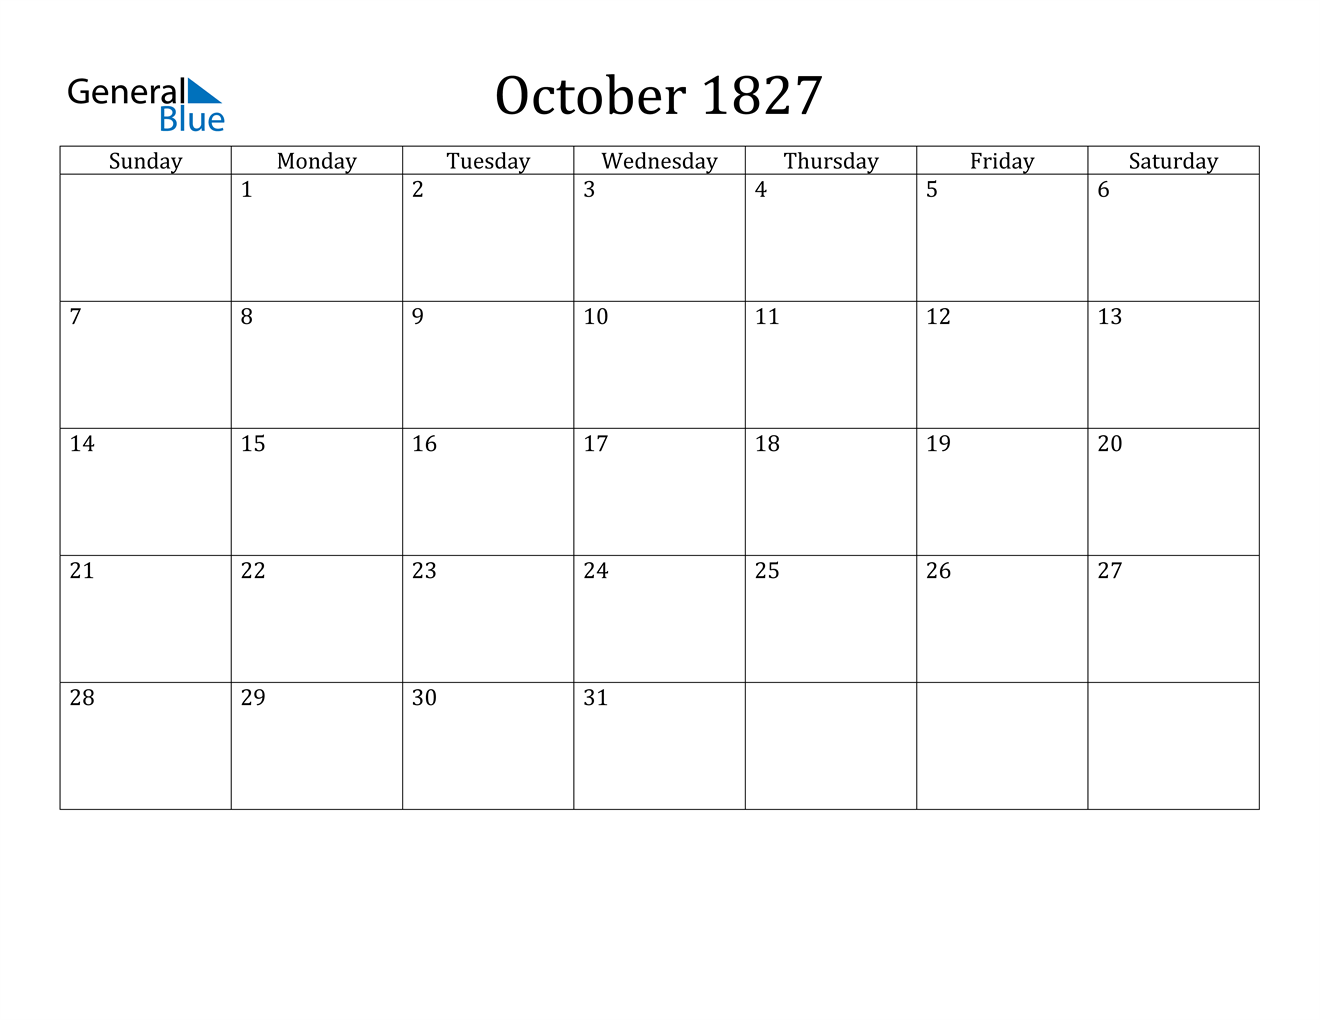 Image of October 1827 Calendar